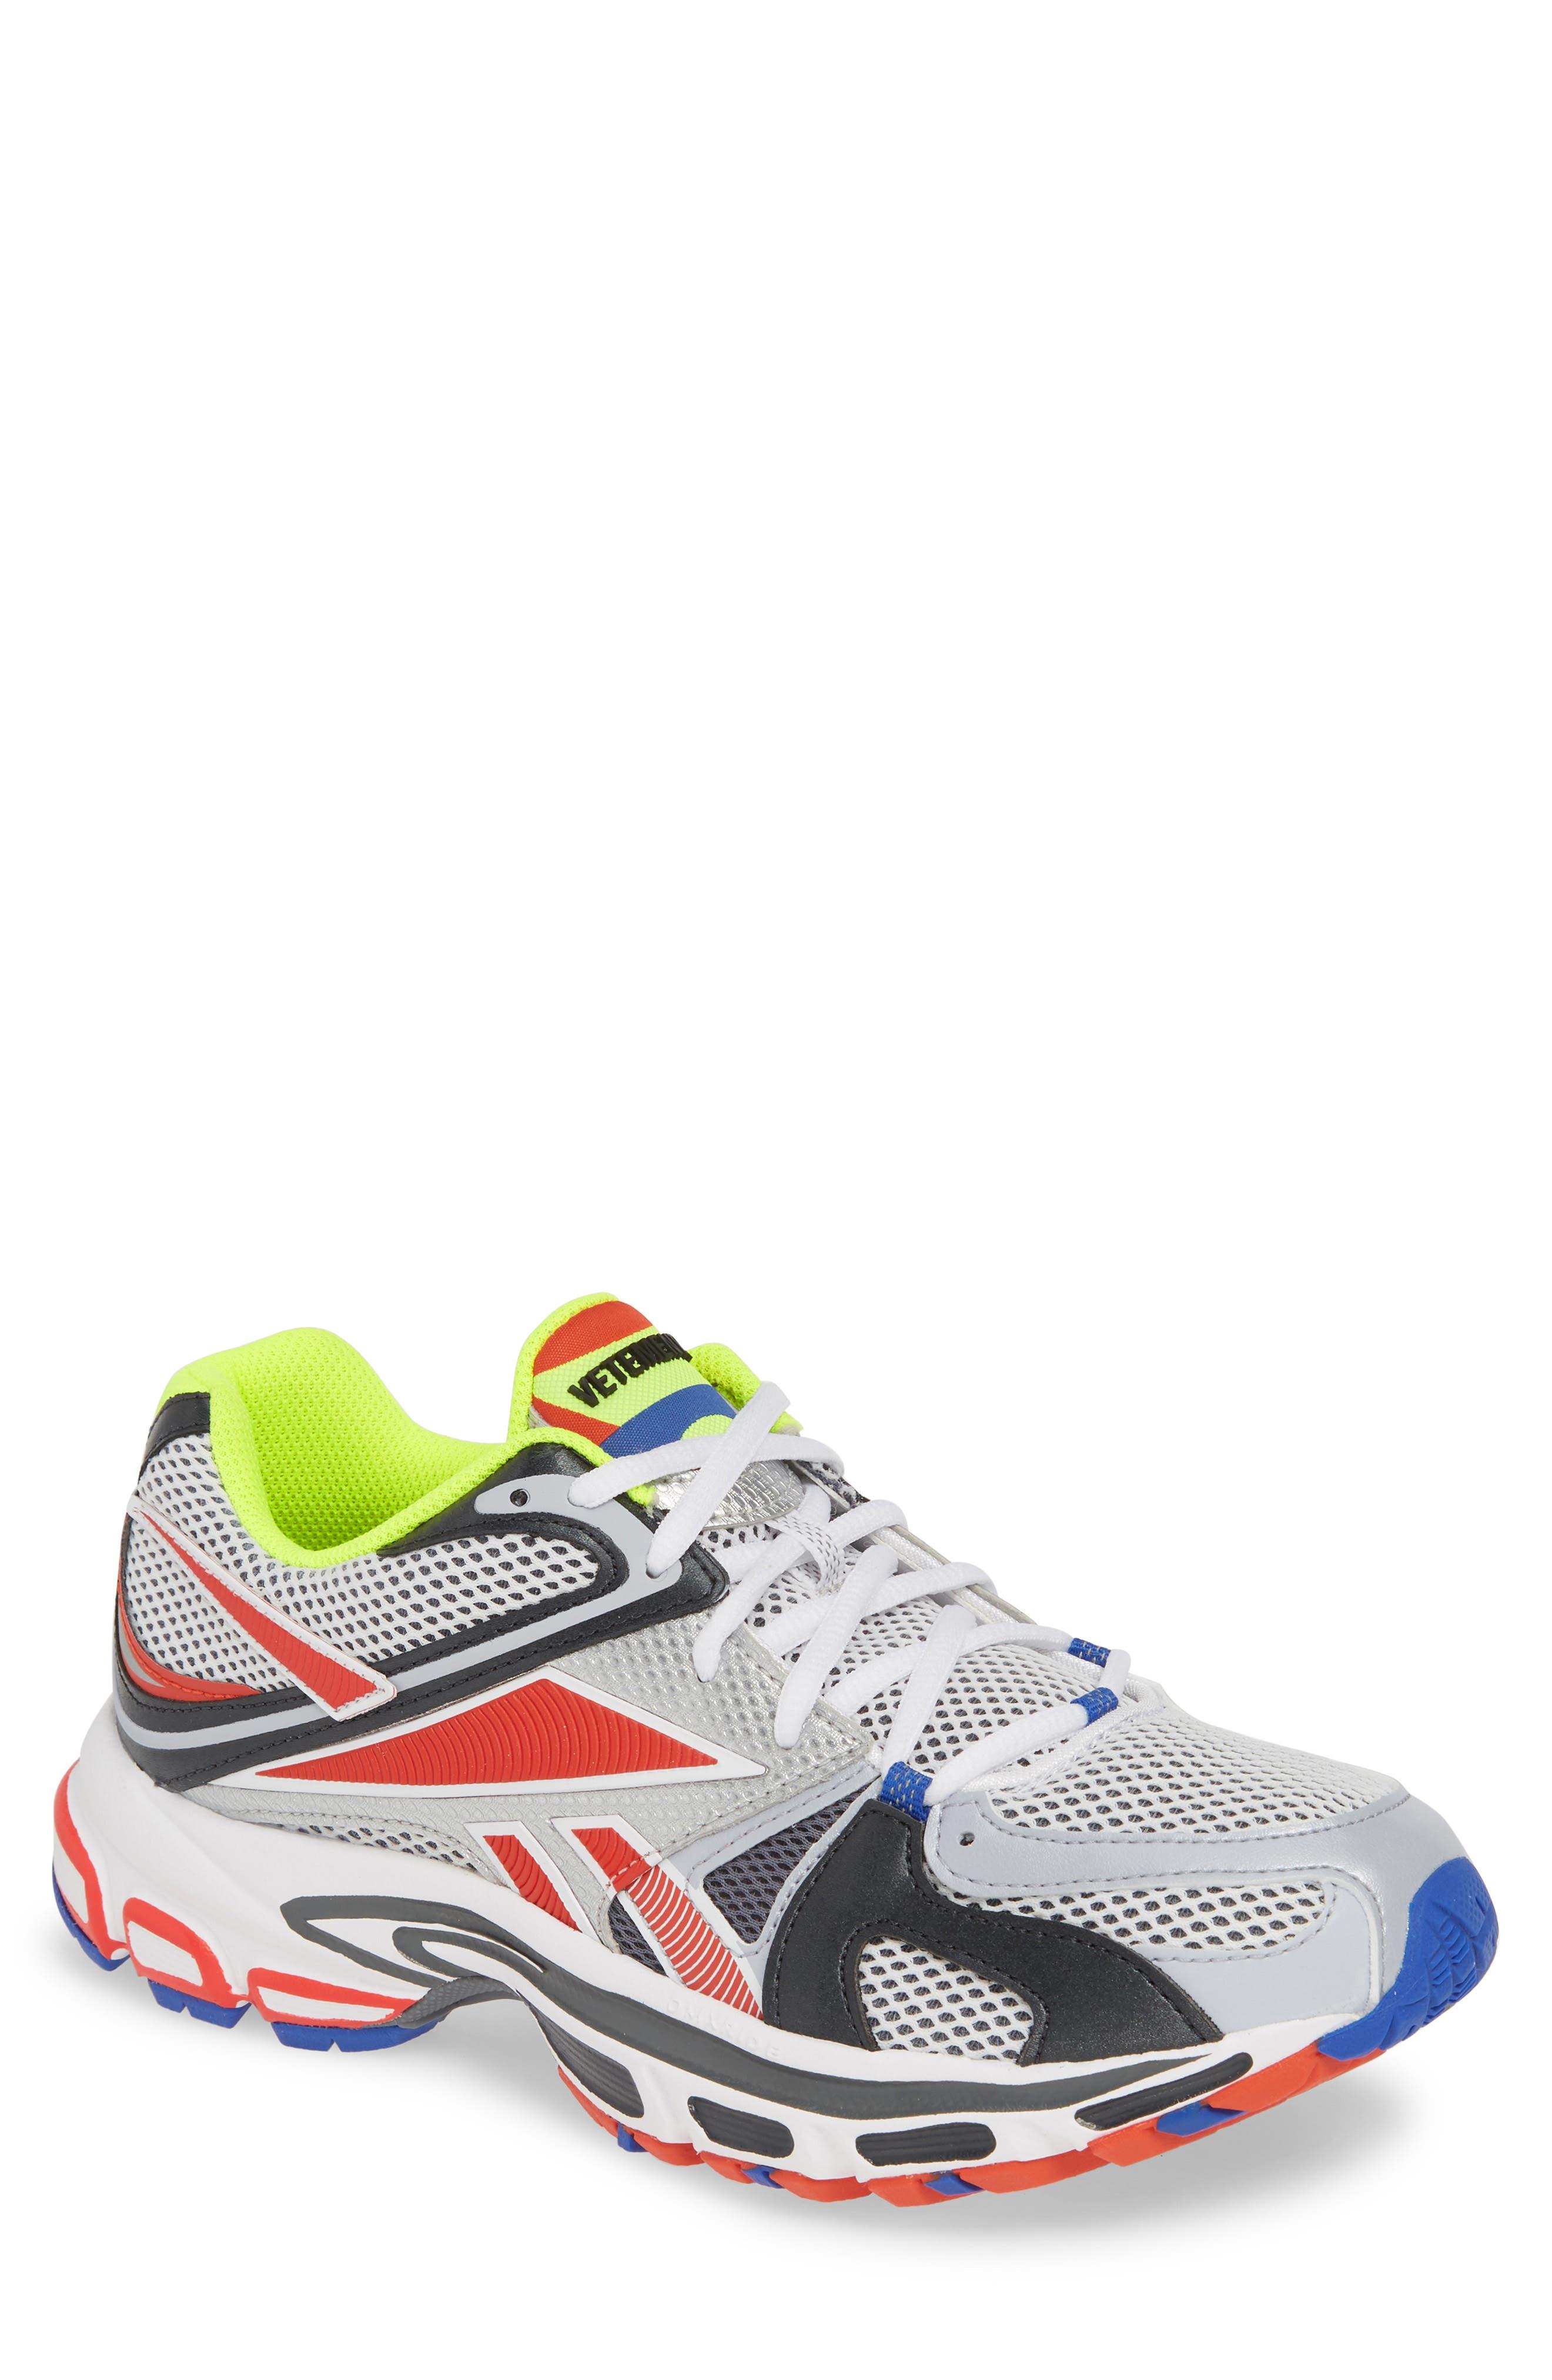 VETEMENTS, x Reebok Spike Runner 200 Sneaker, Main thumbnail 1, color, FLUO YELLOW